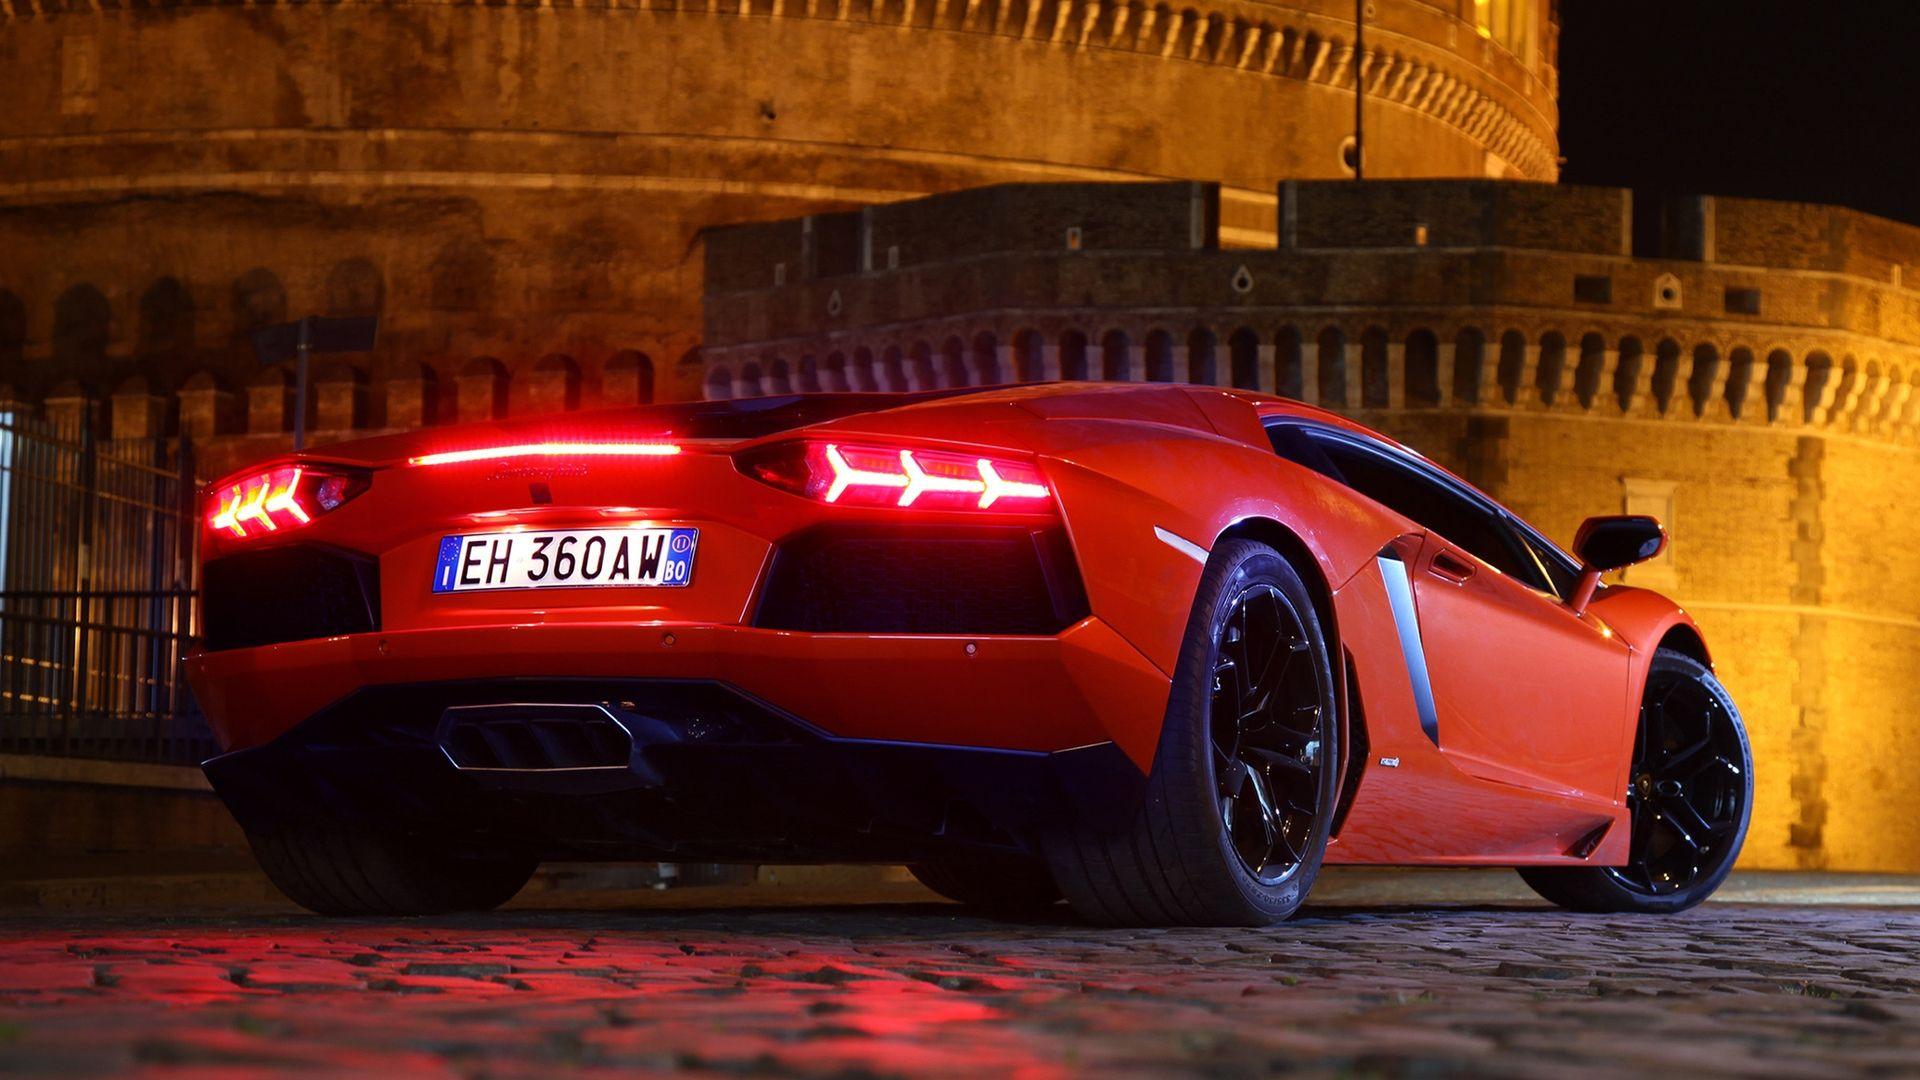 Hamann Lamborghini Aventador Wallpapers Hd Wallpapers